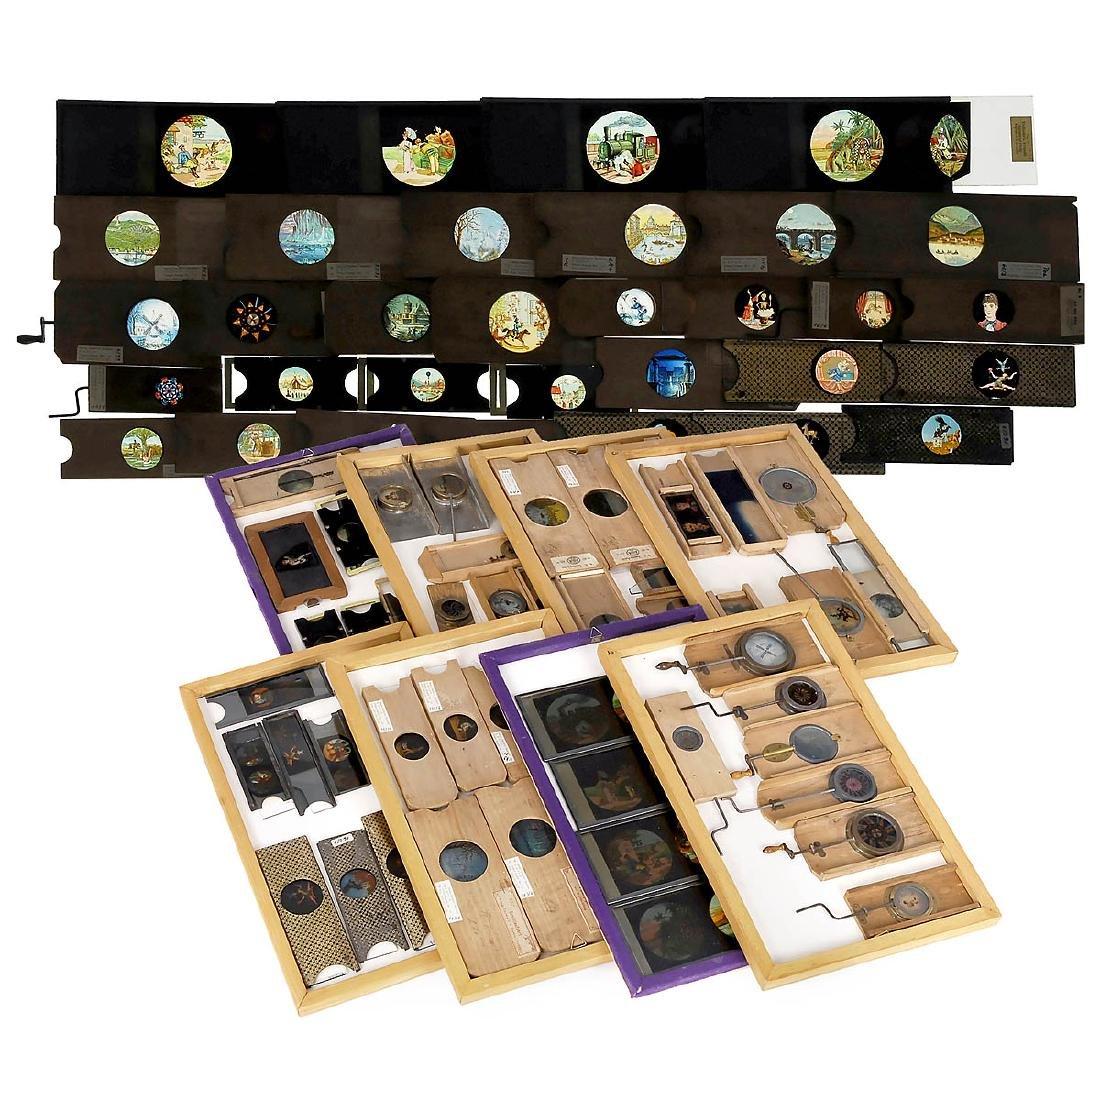 59 Mechanical Magic Lantern Slides in Wood Cases